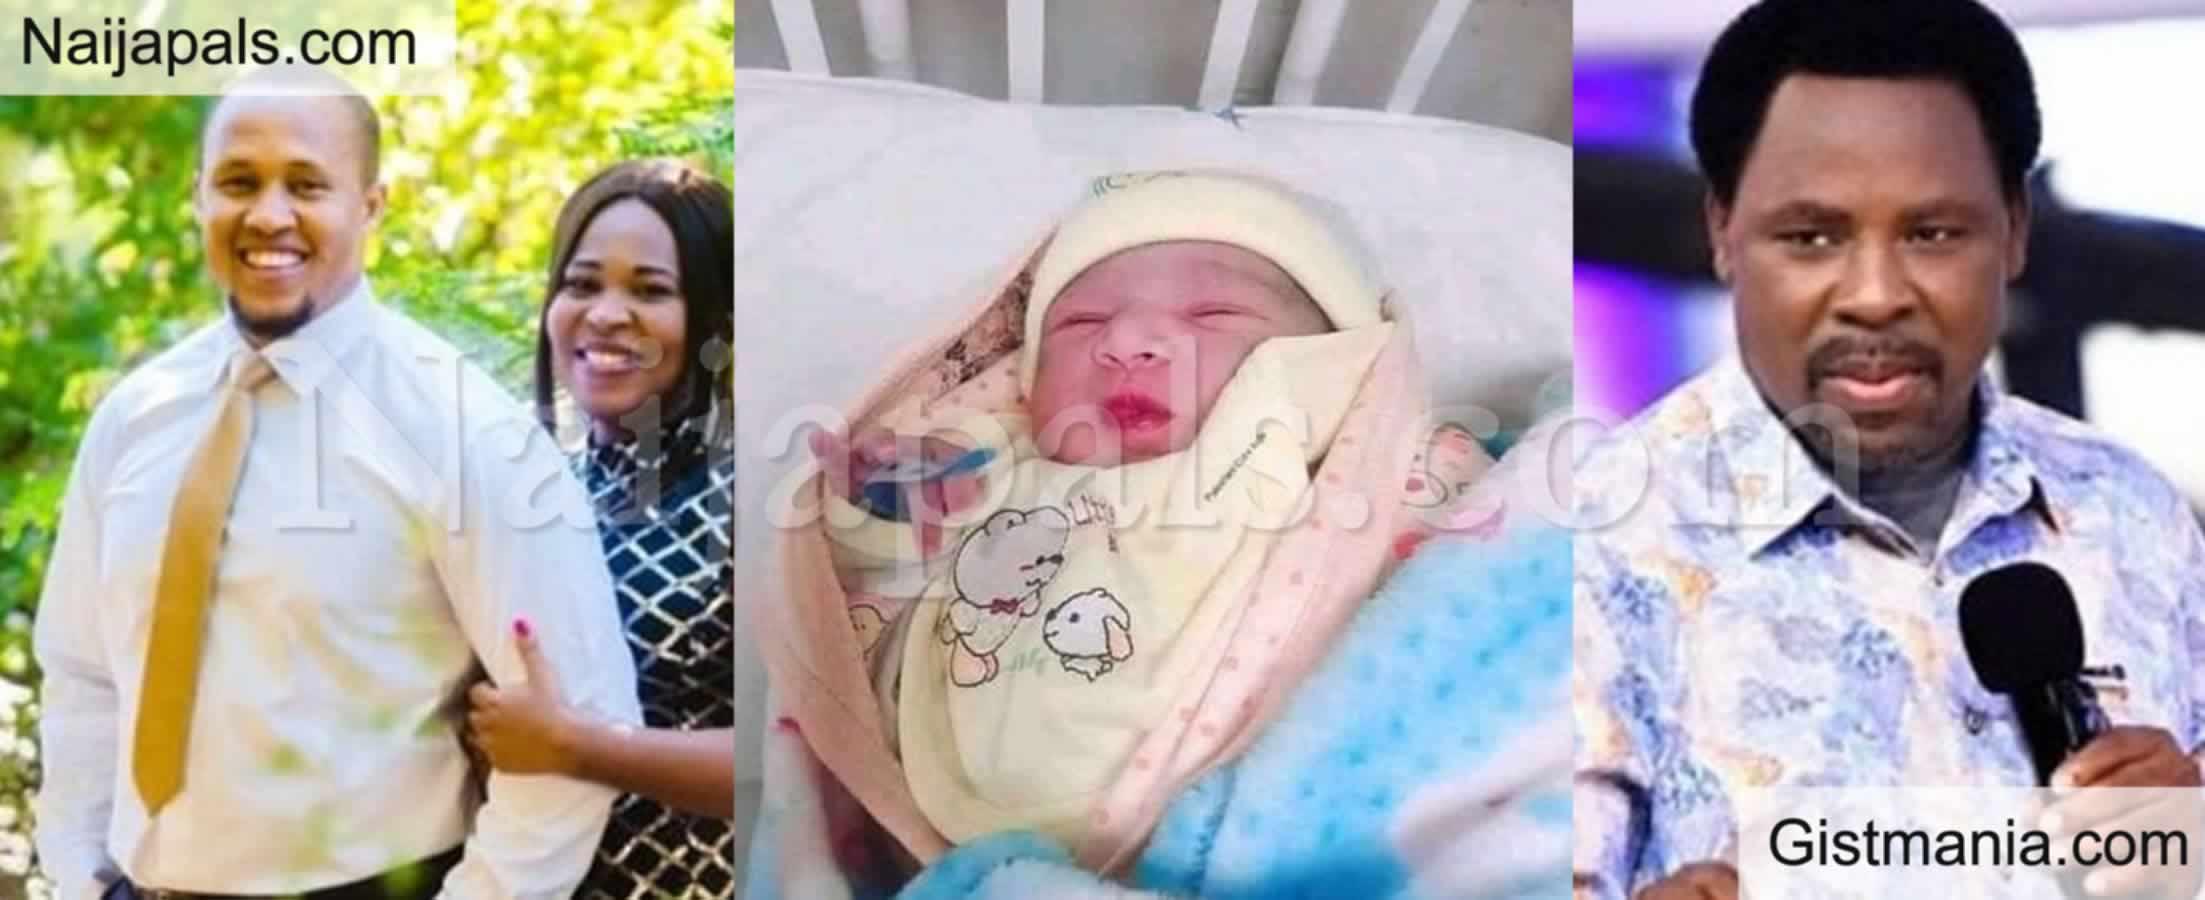 <img alt='.' class='lazyload' data-src='https://img.gistmania.com/emot/news.gif' /> <b>TB Joshua's Daughter Welcomes Baby Boy On Her Father's Birthday</b>